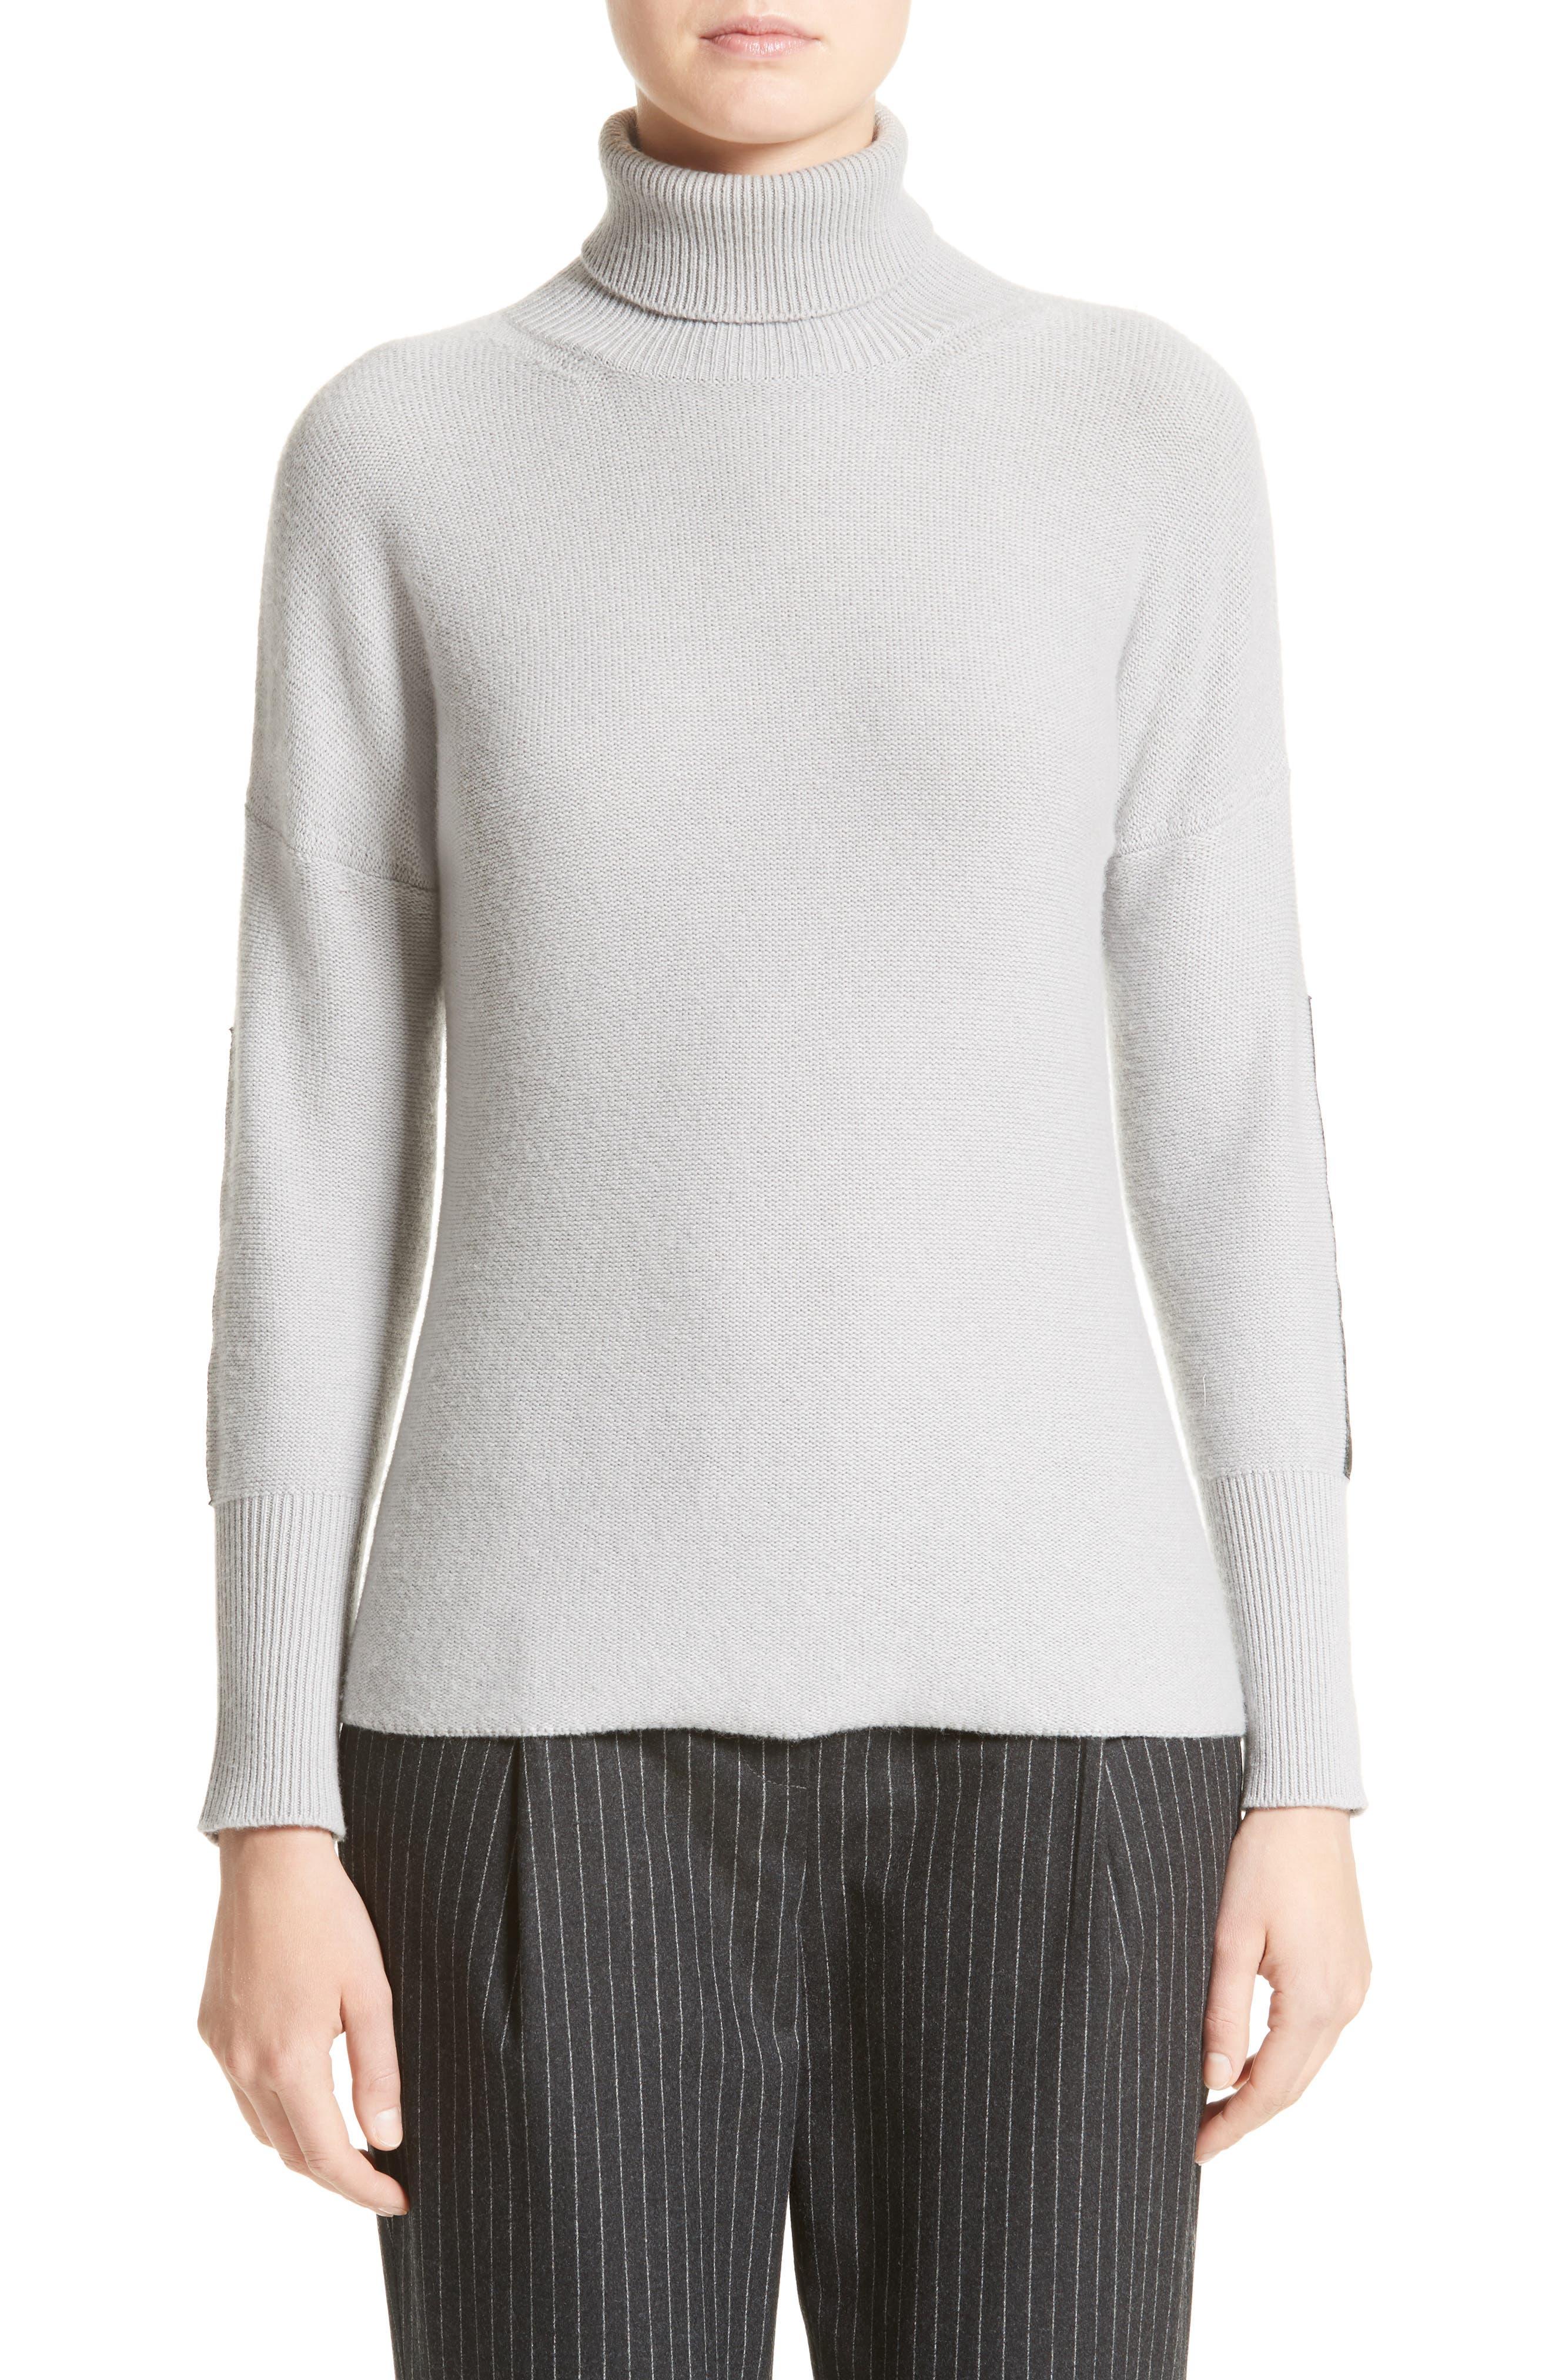 Fabiana Filippi Wool, Silk & Cashmere Knit Turtleneck